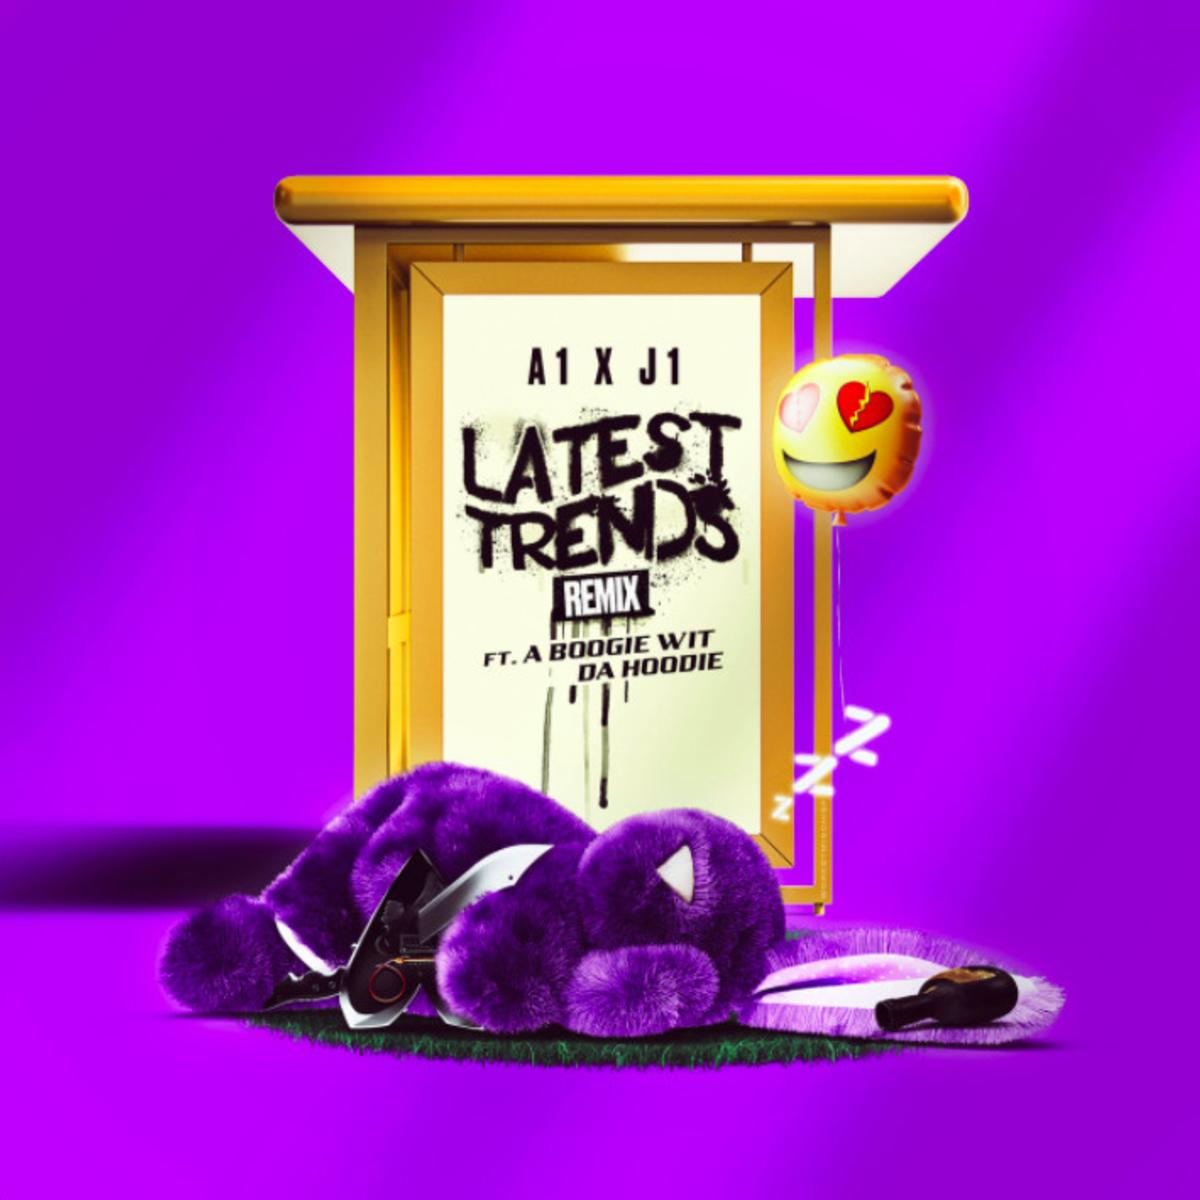 MP3: A1 x J1 - Latest Trends (Remix) Ft. A Boogie Wit Da Hoodie